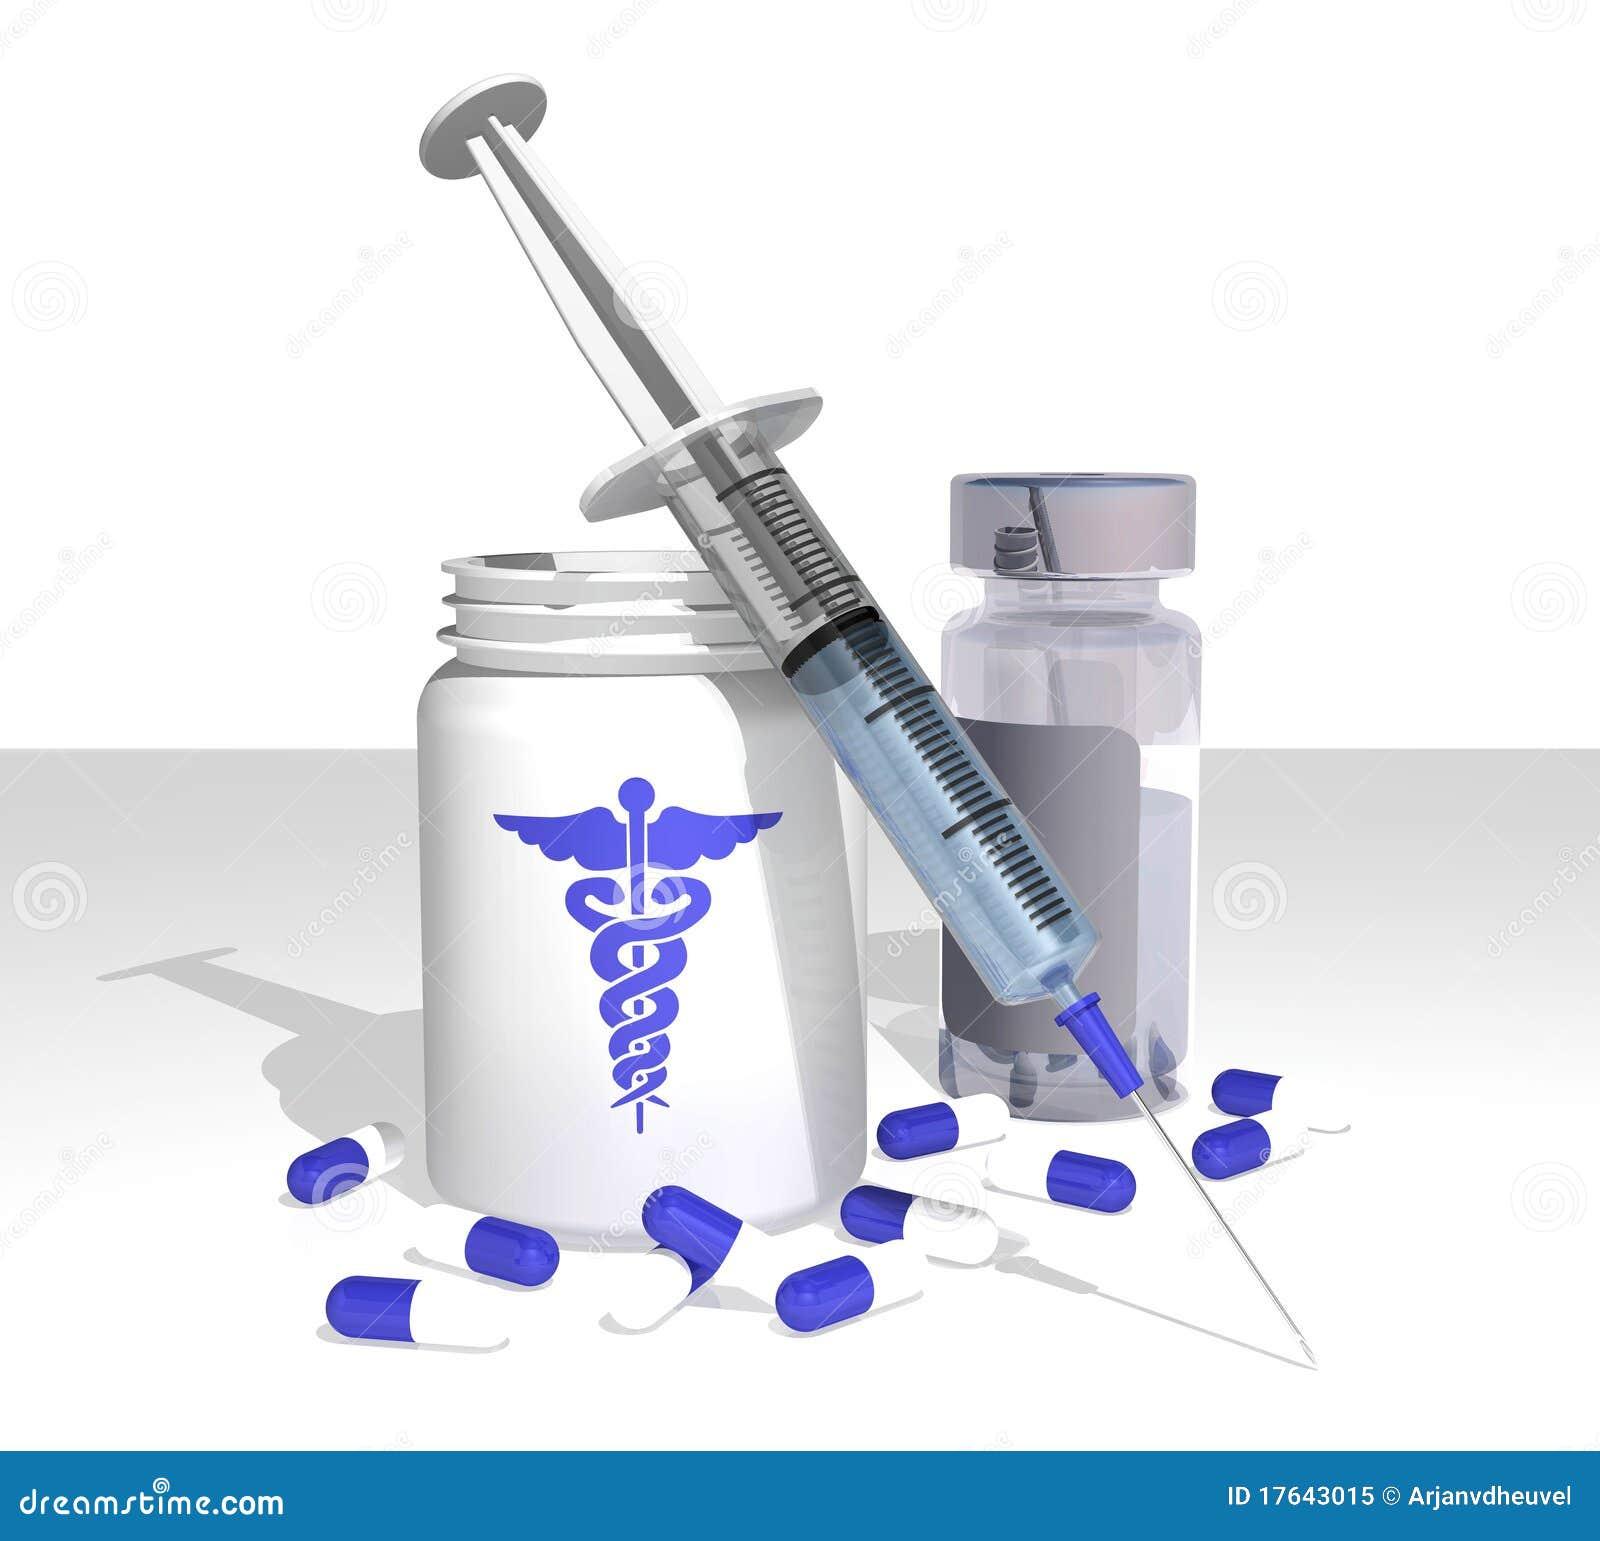 Medical Items Royalty Free Stock Photo - Image: 17643015